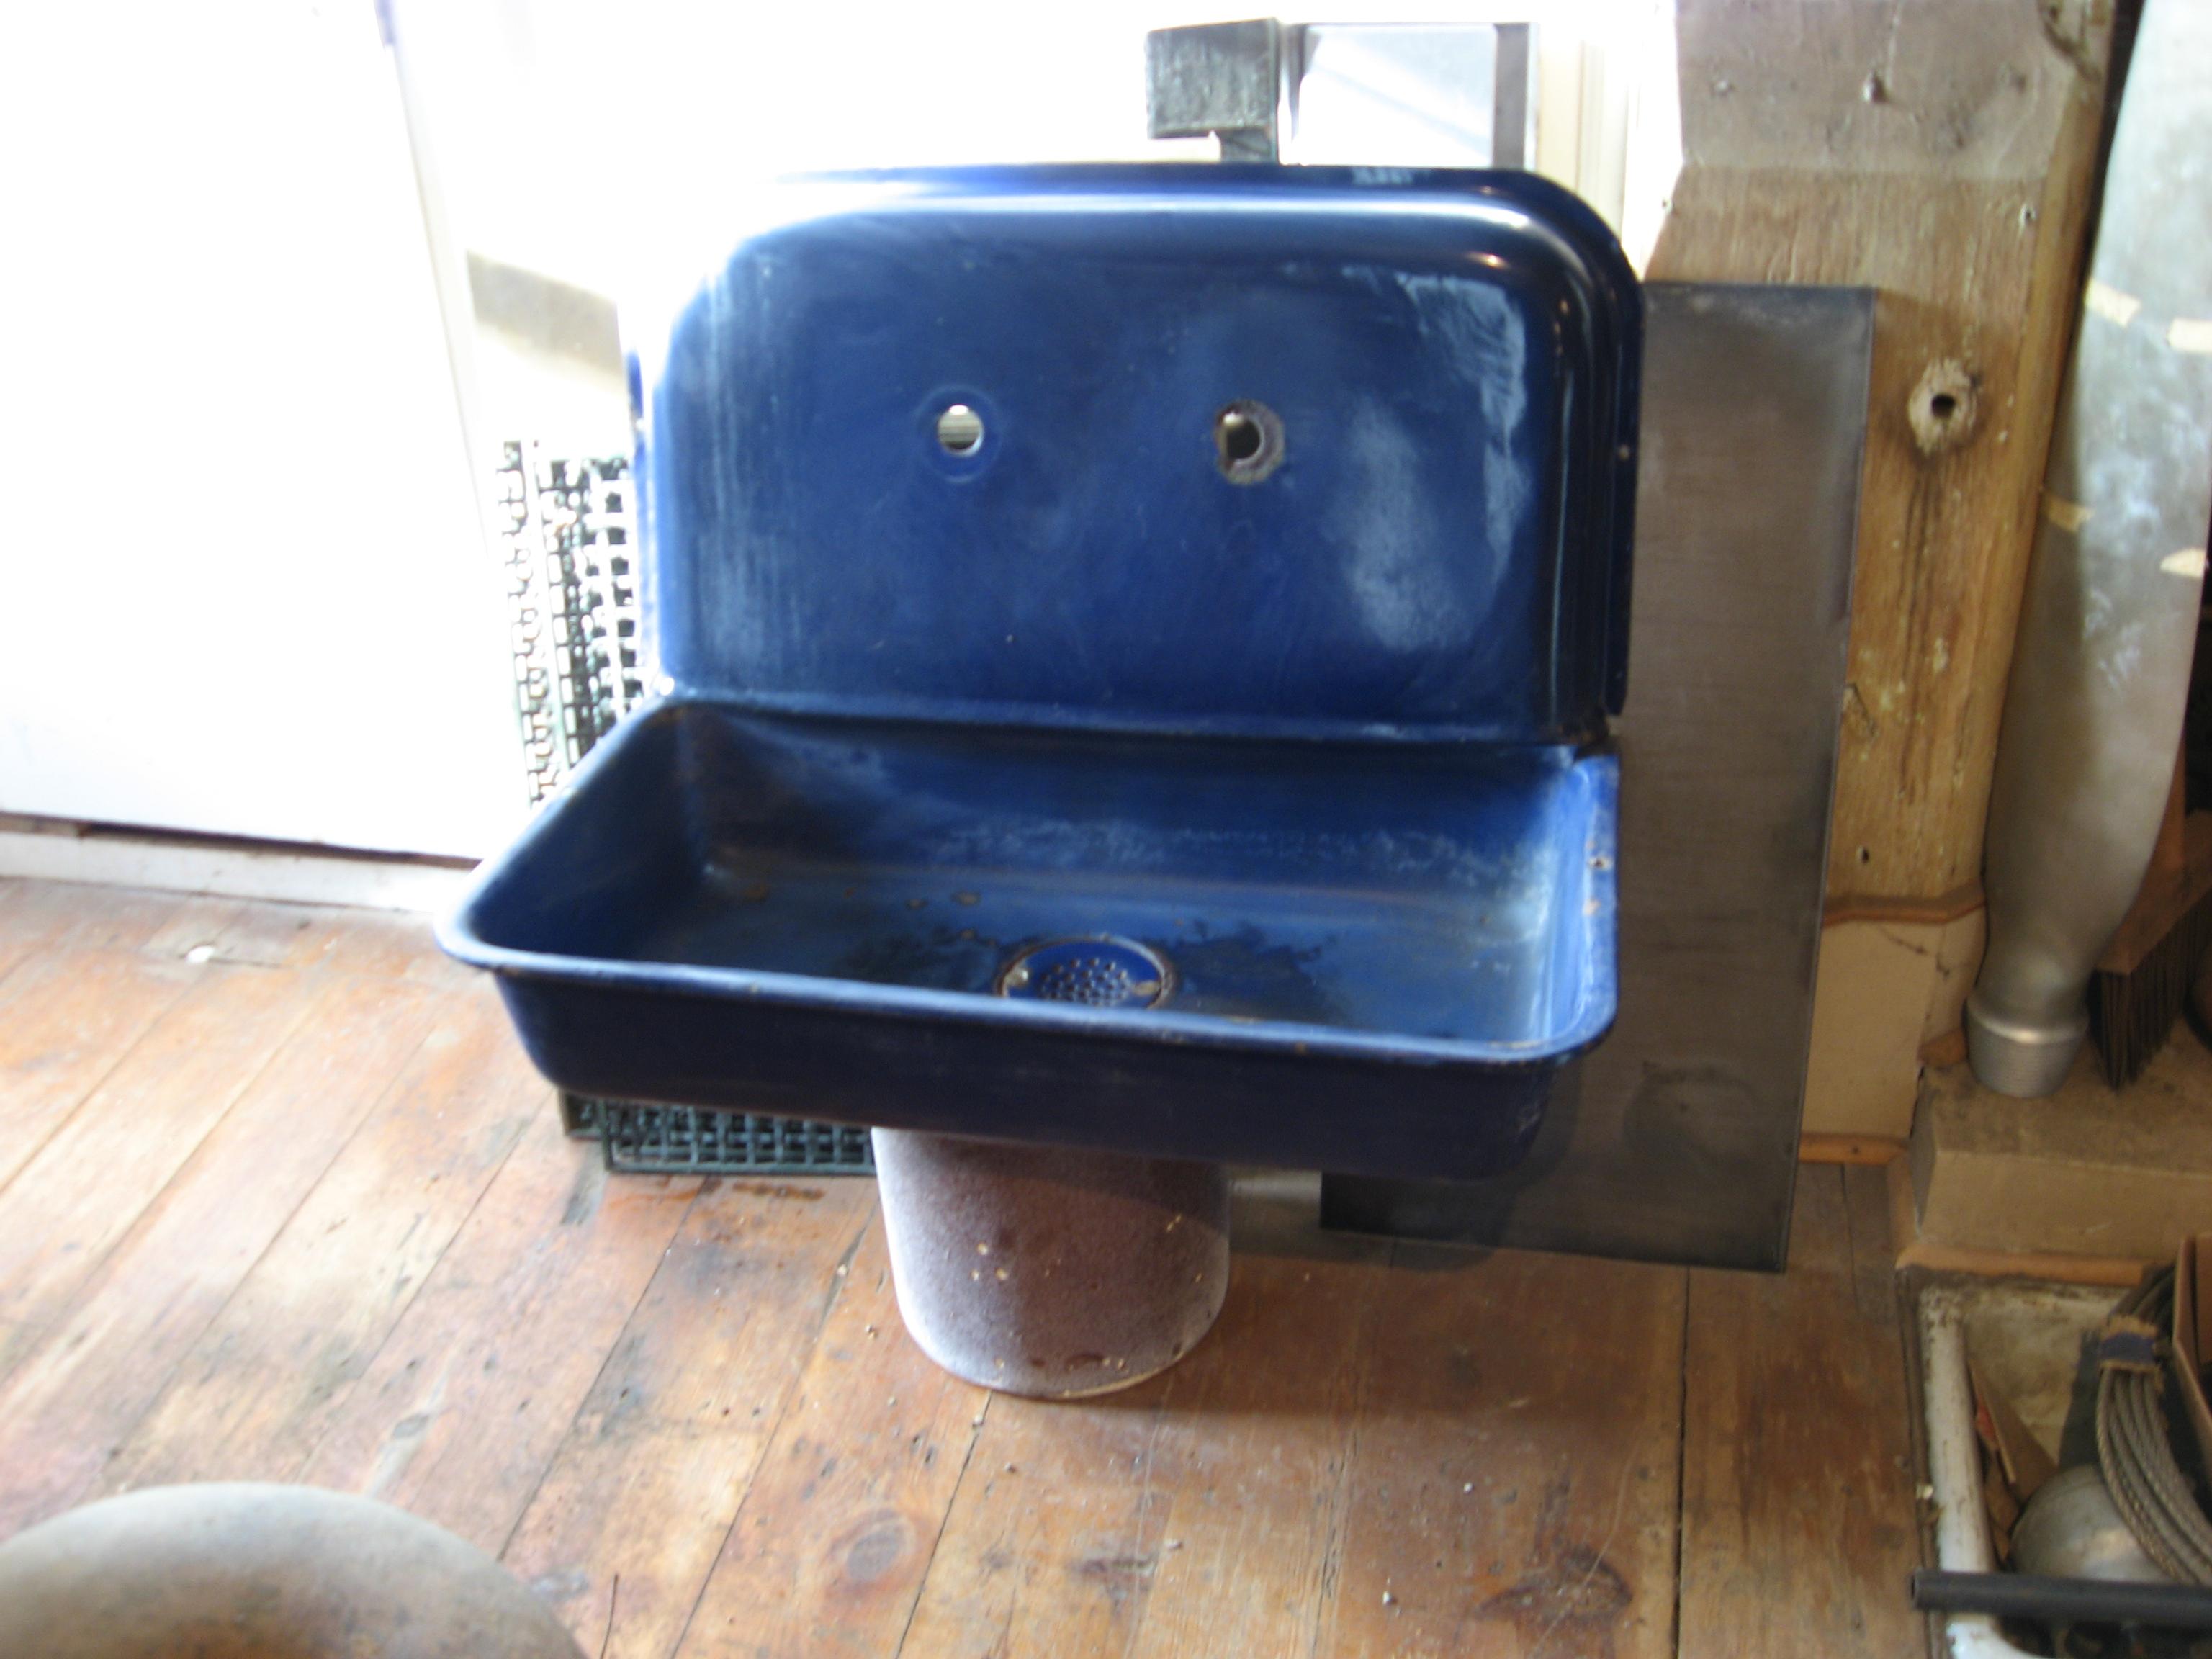 Cobalt Blue Toilet Cobalt Blue Kitchen Sink